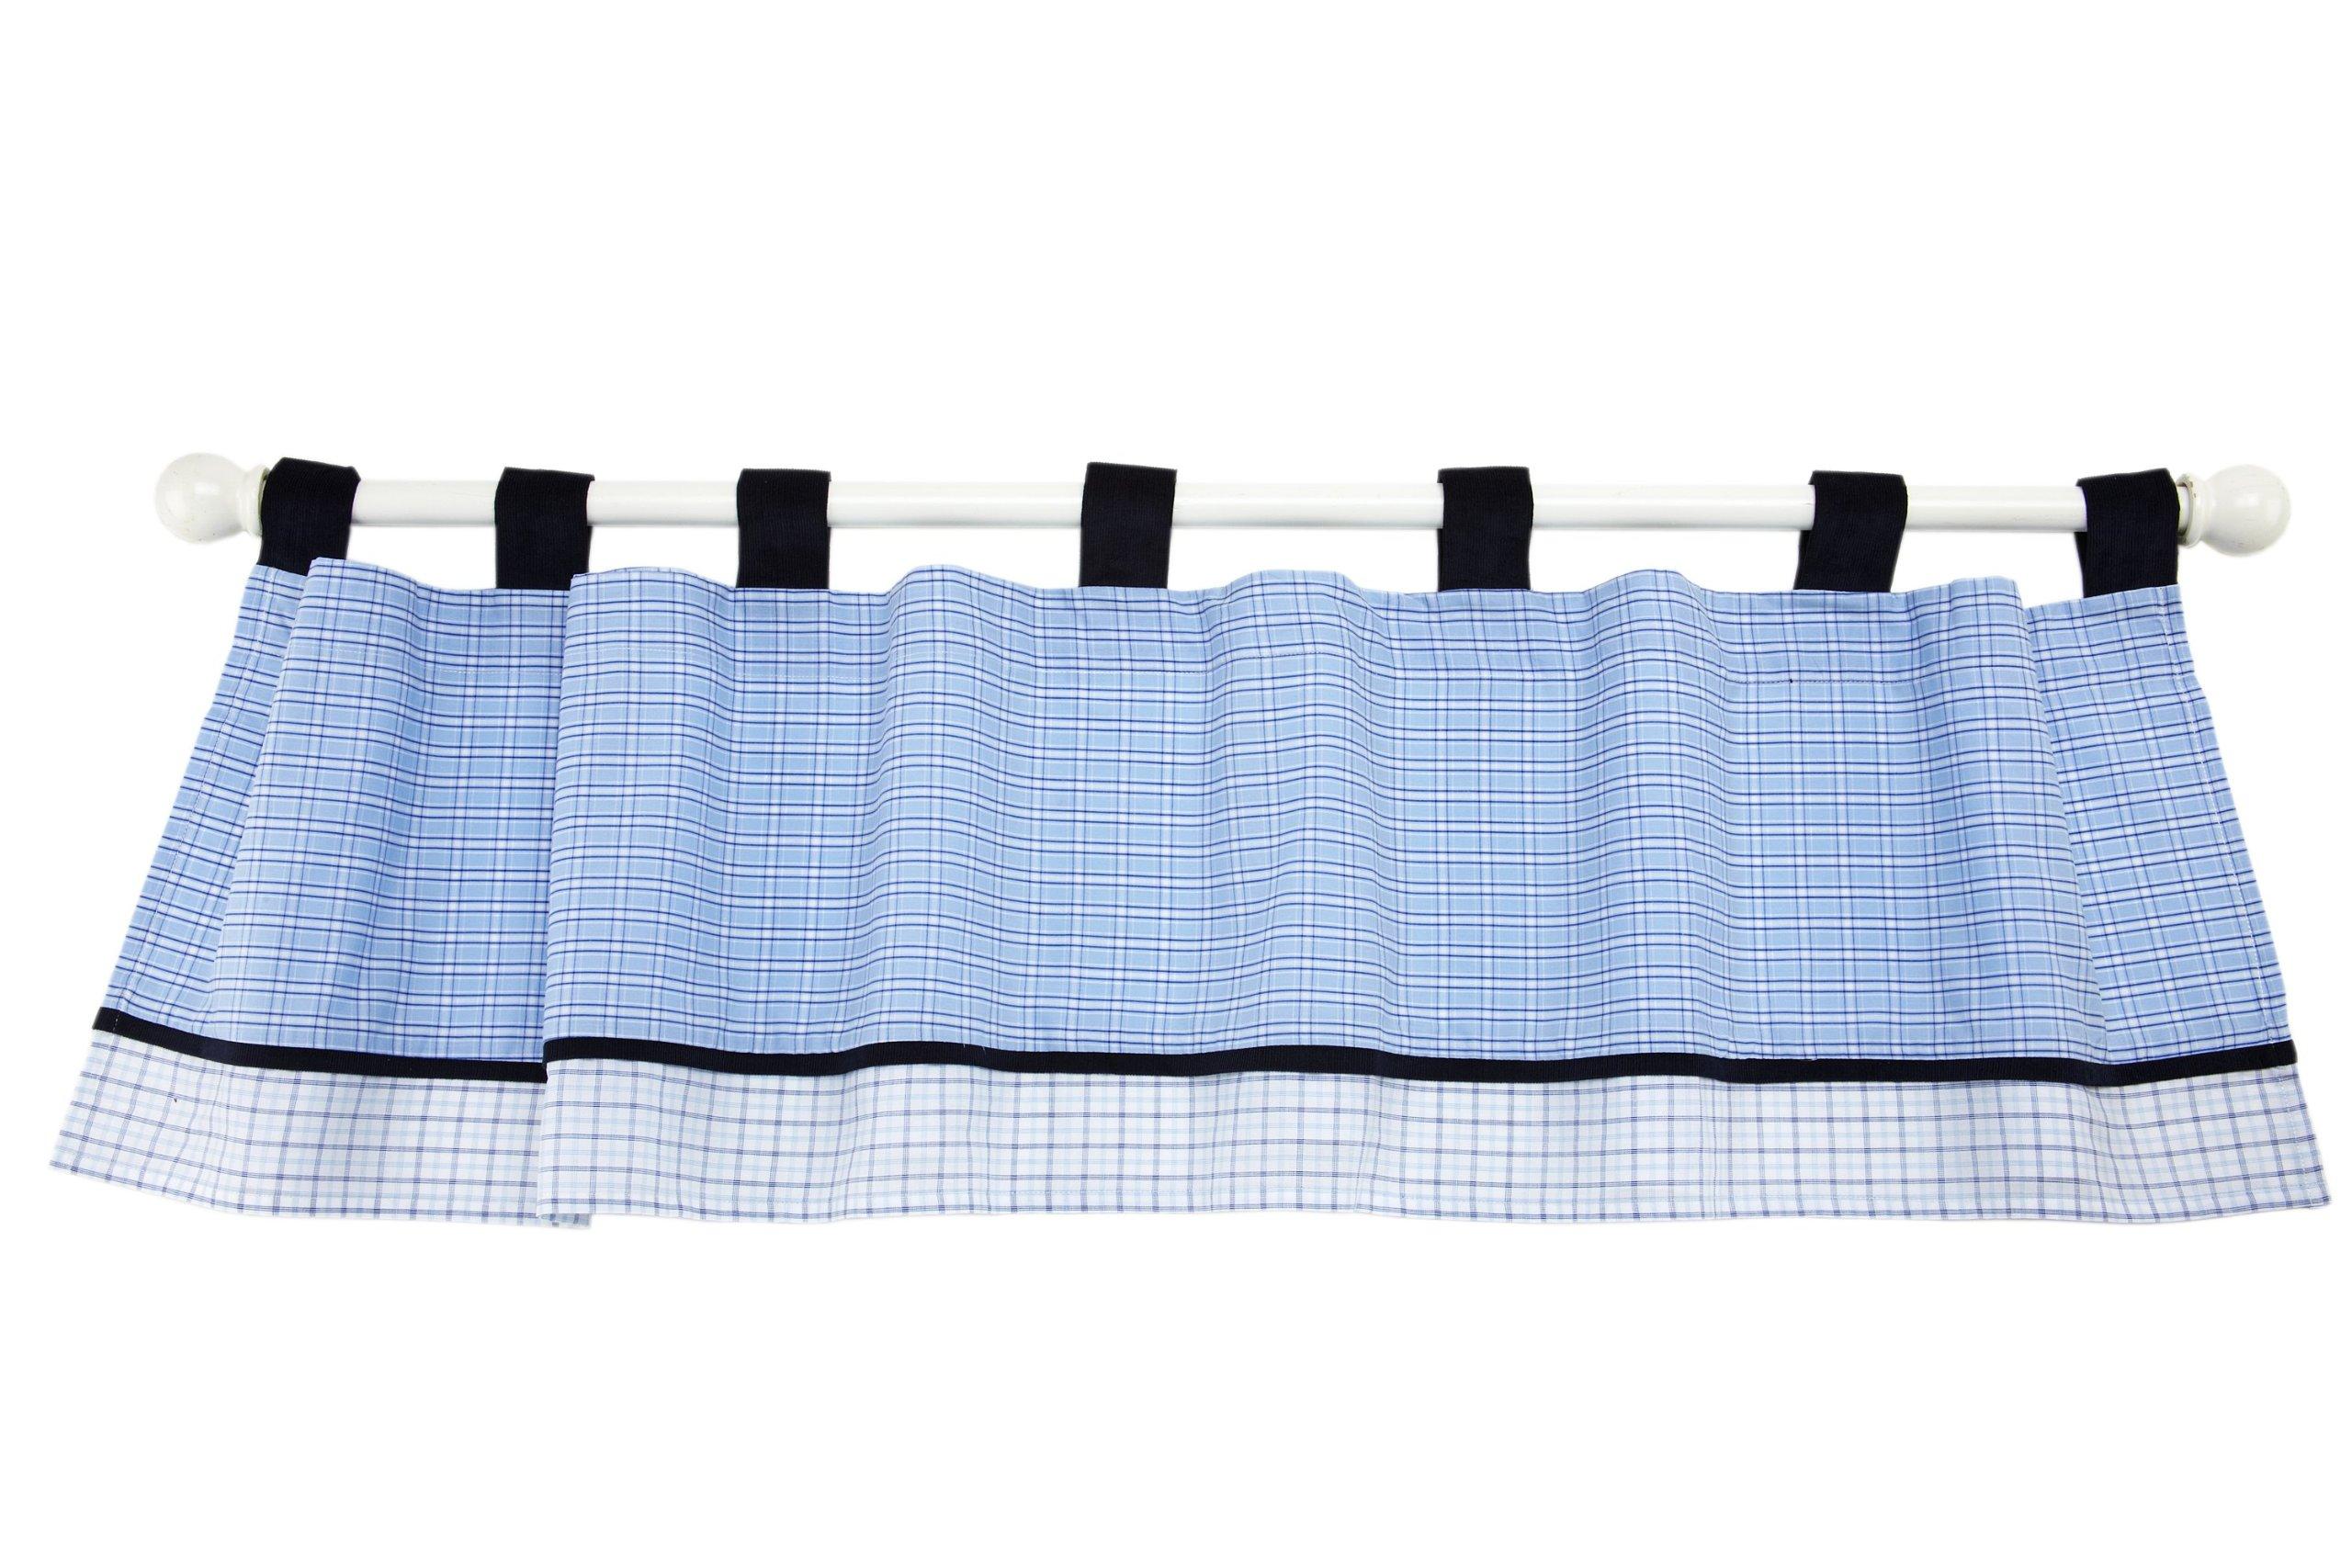 Amazon.com : Nautica Kids William 6 Piece Bedding Set : Crib Bedding Sets : Baby